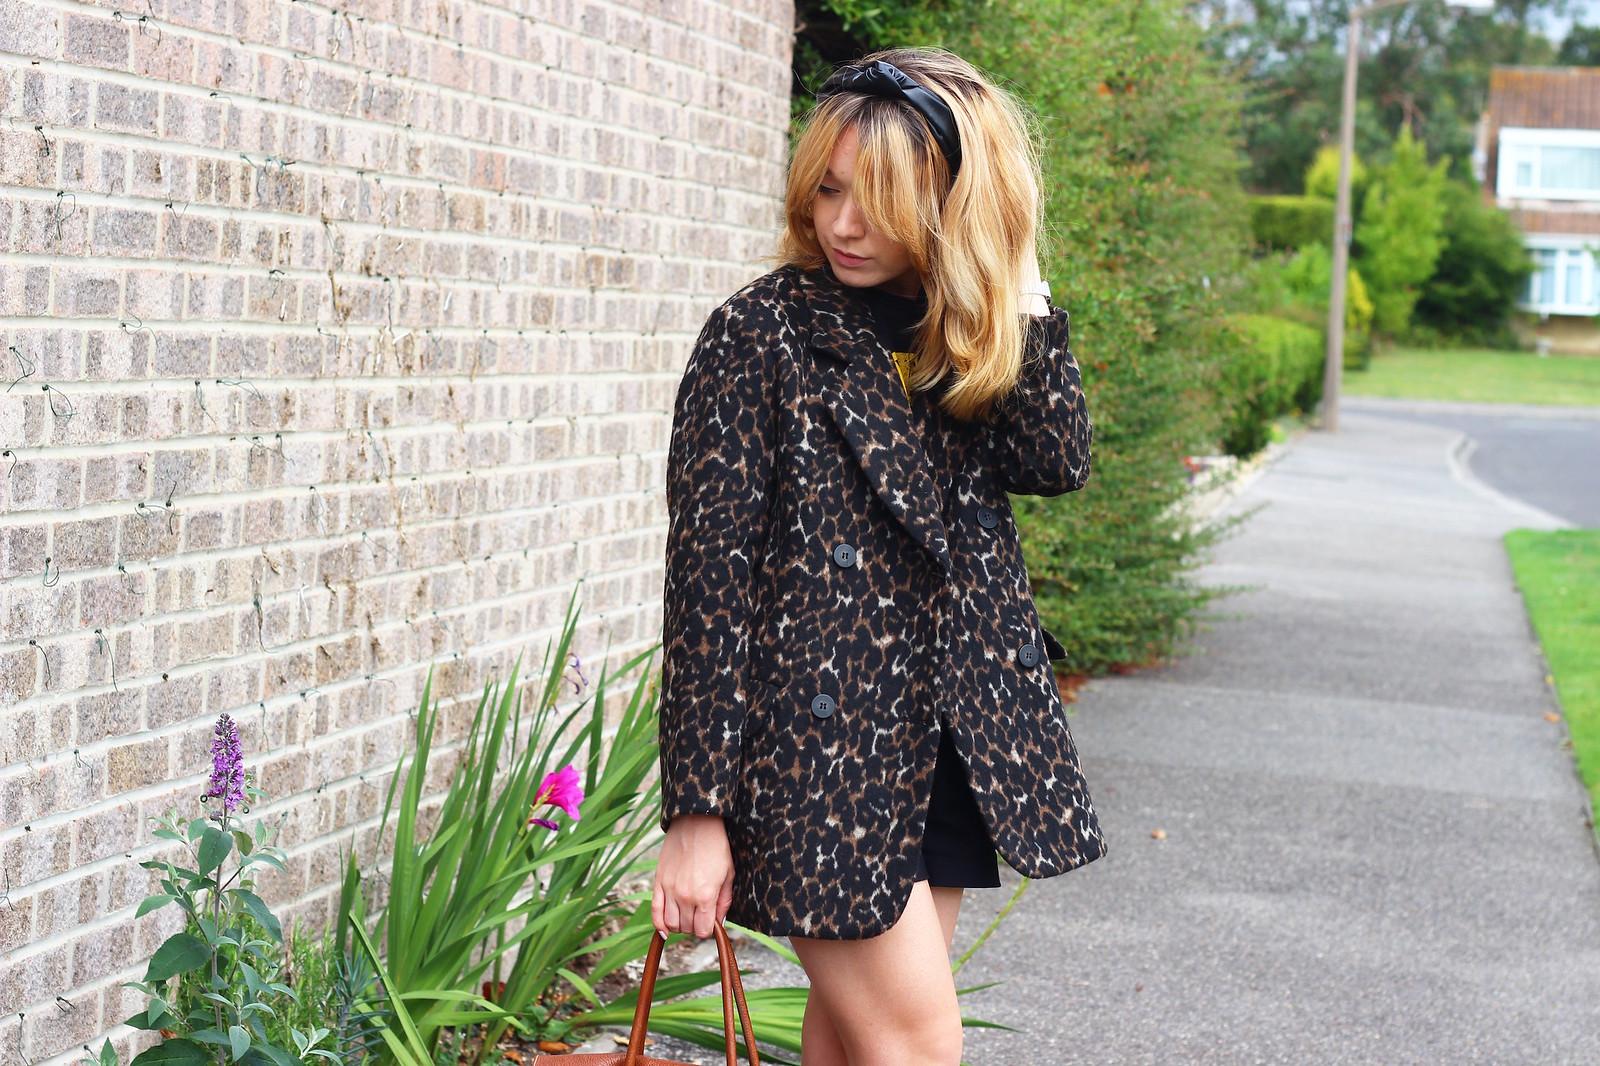 4leopardprintjacket, leopard print jacket h&m, outfit, retro, style